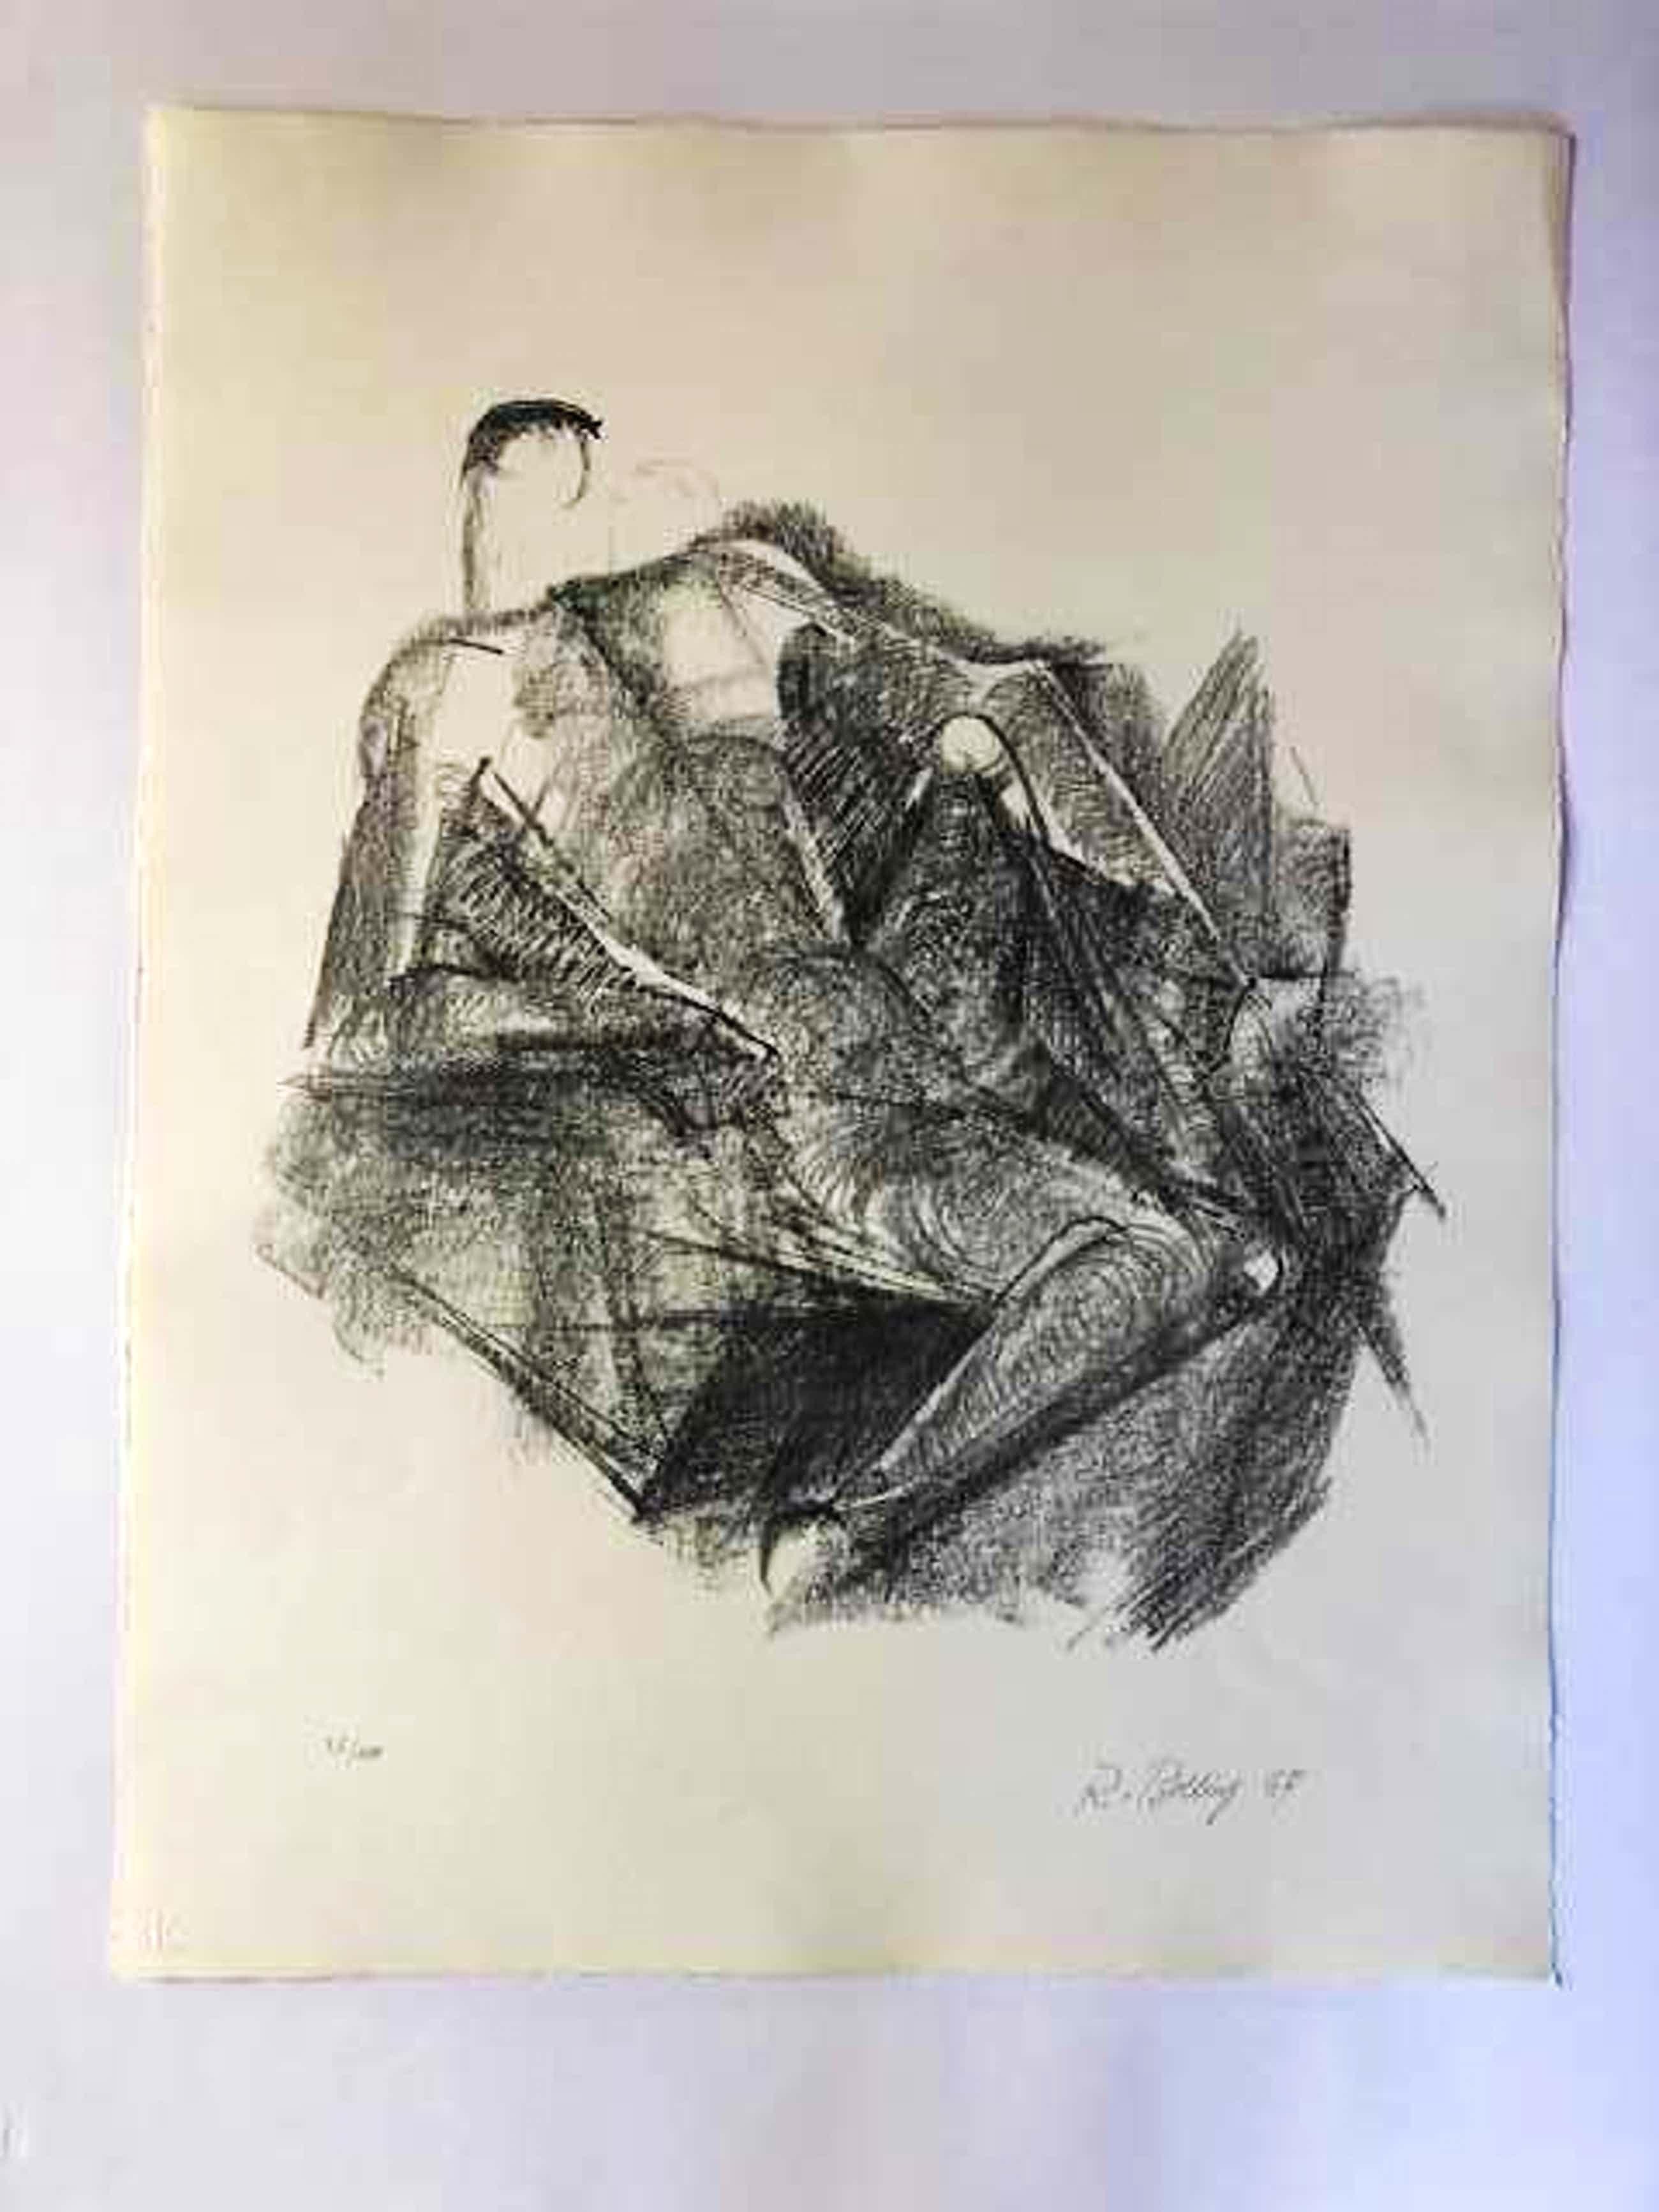 Rudolph Belling - Ruhender - Lithographie - 1967 kopen? Bied vanaf 125!